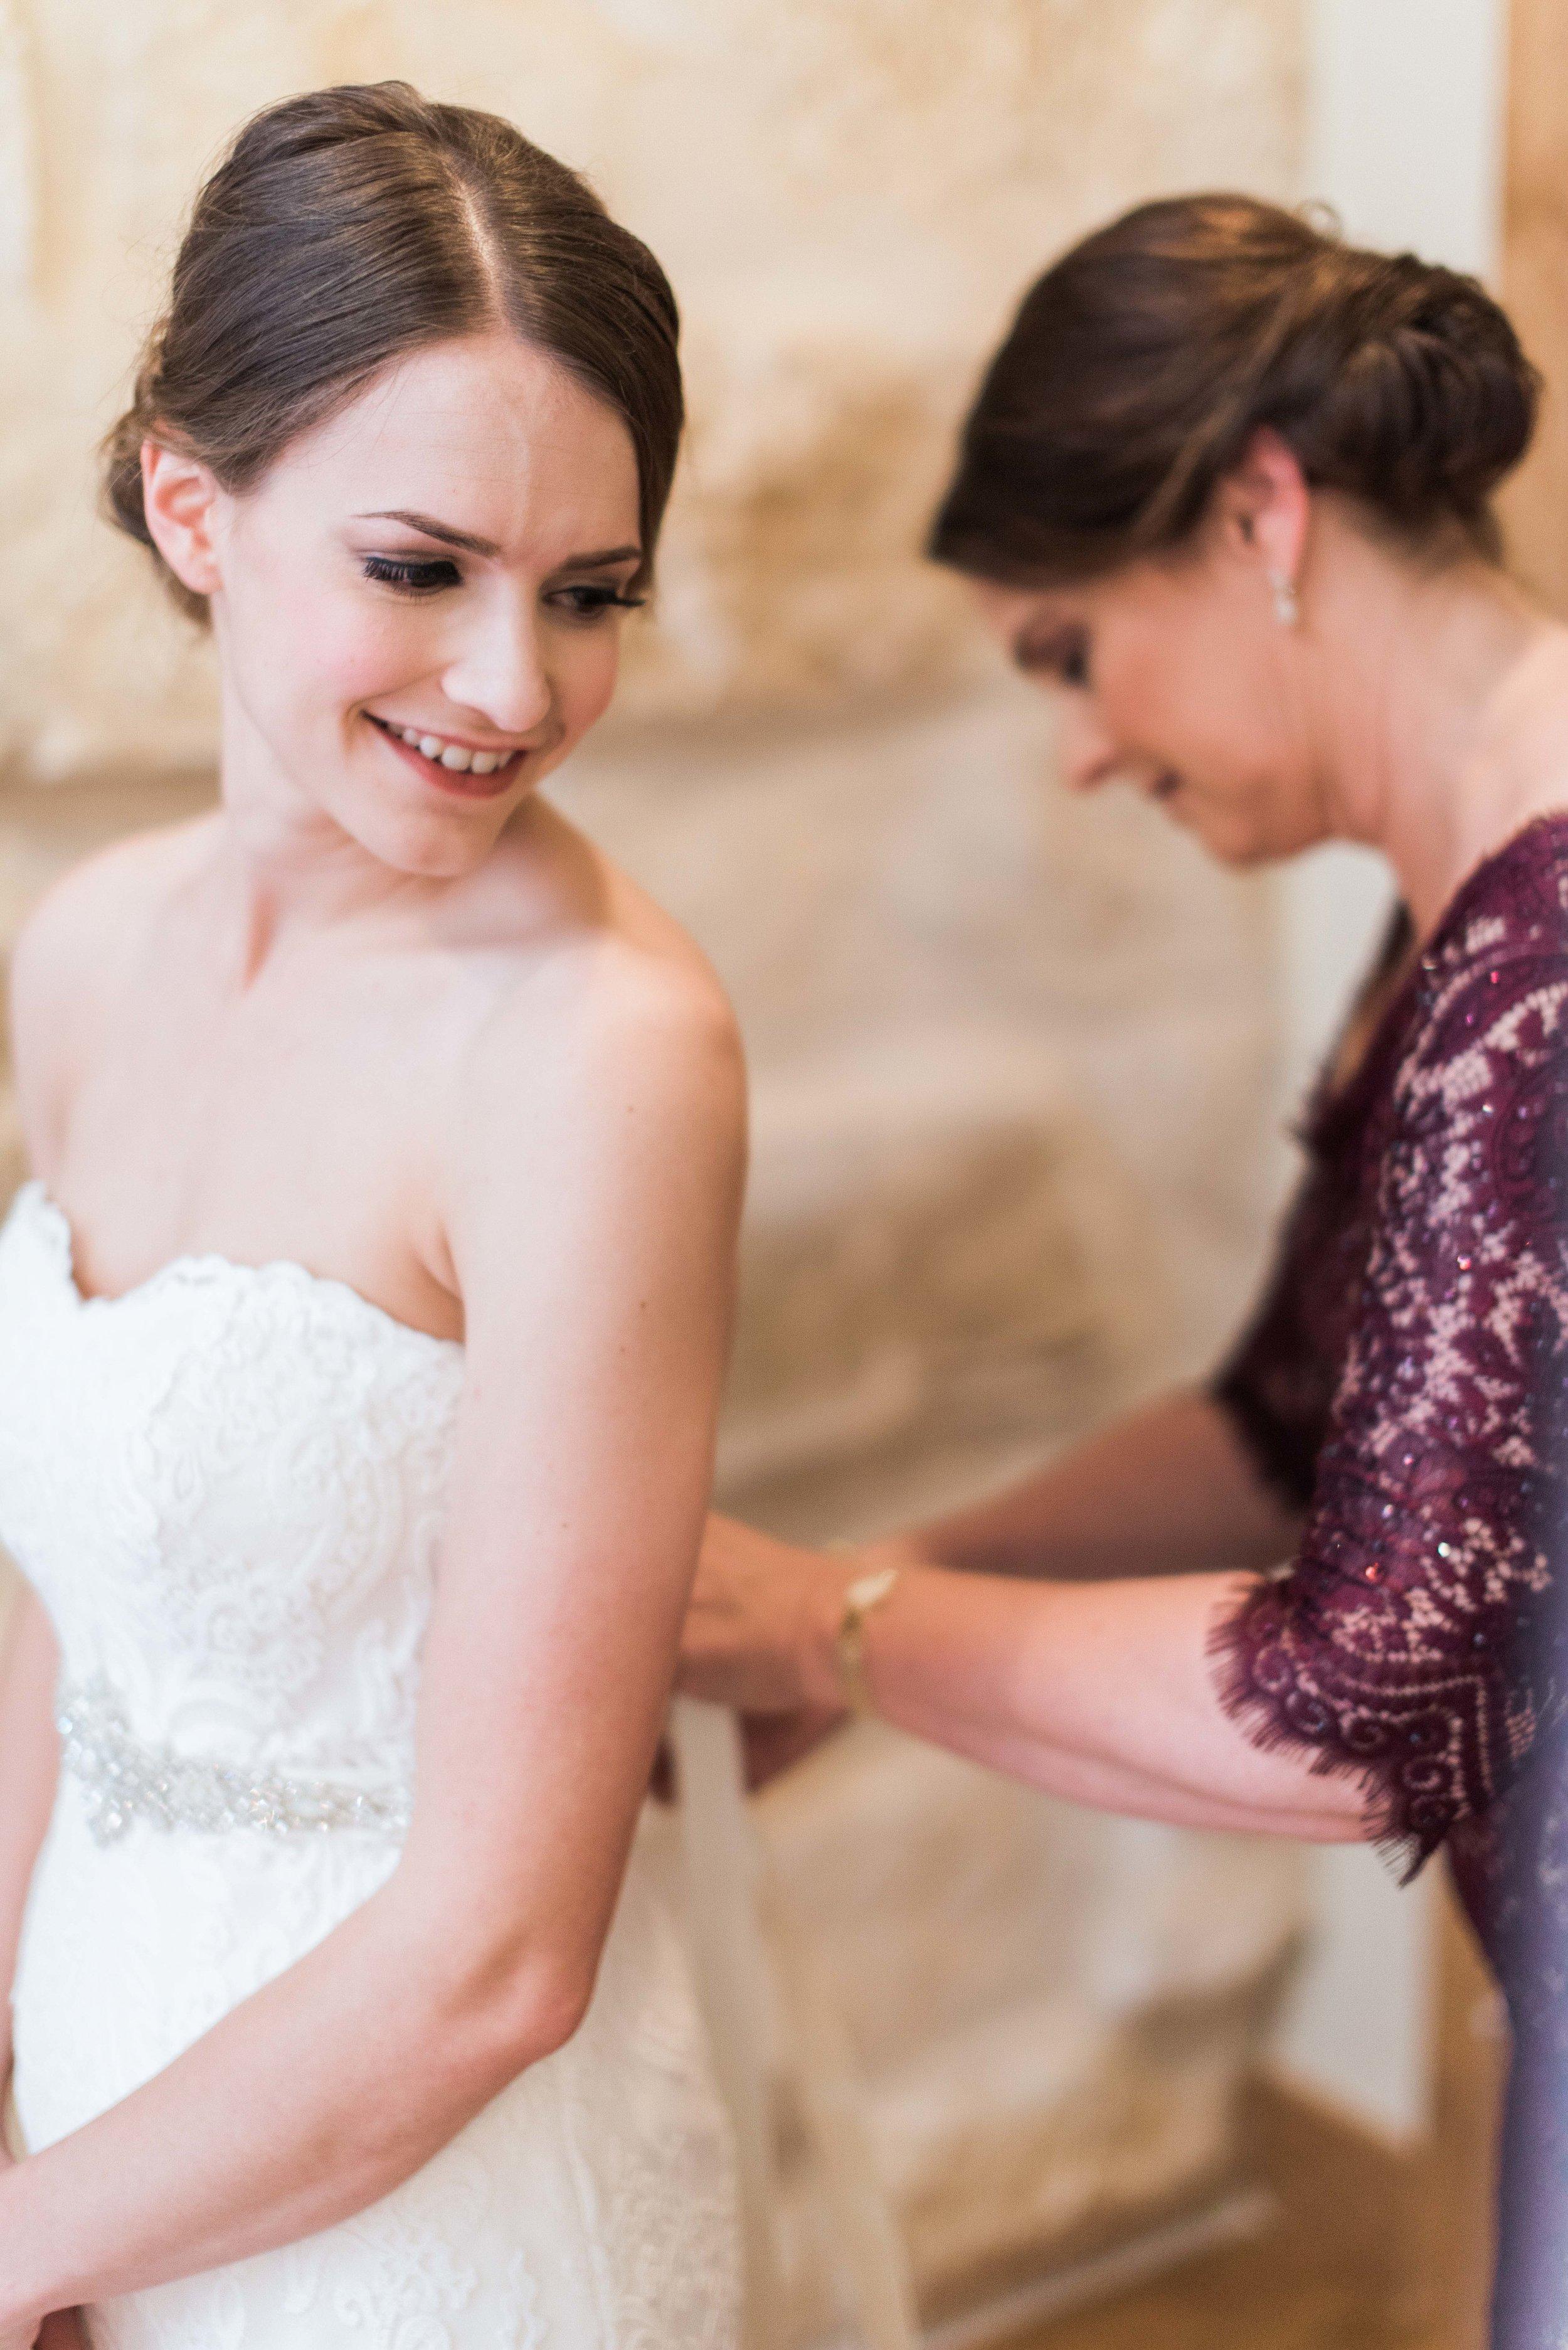 The-Knot-Wedding-Houston-Photographer-Fine-Art-Dana-Fernandez-Photography-Film-5.jpg